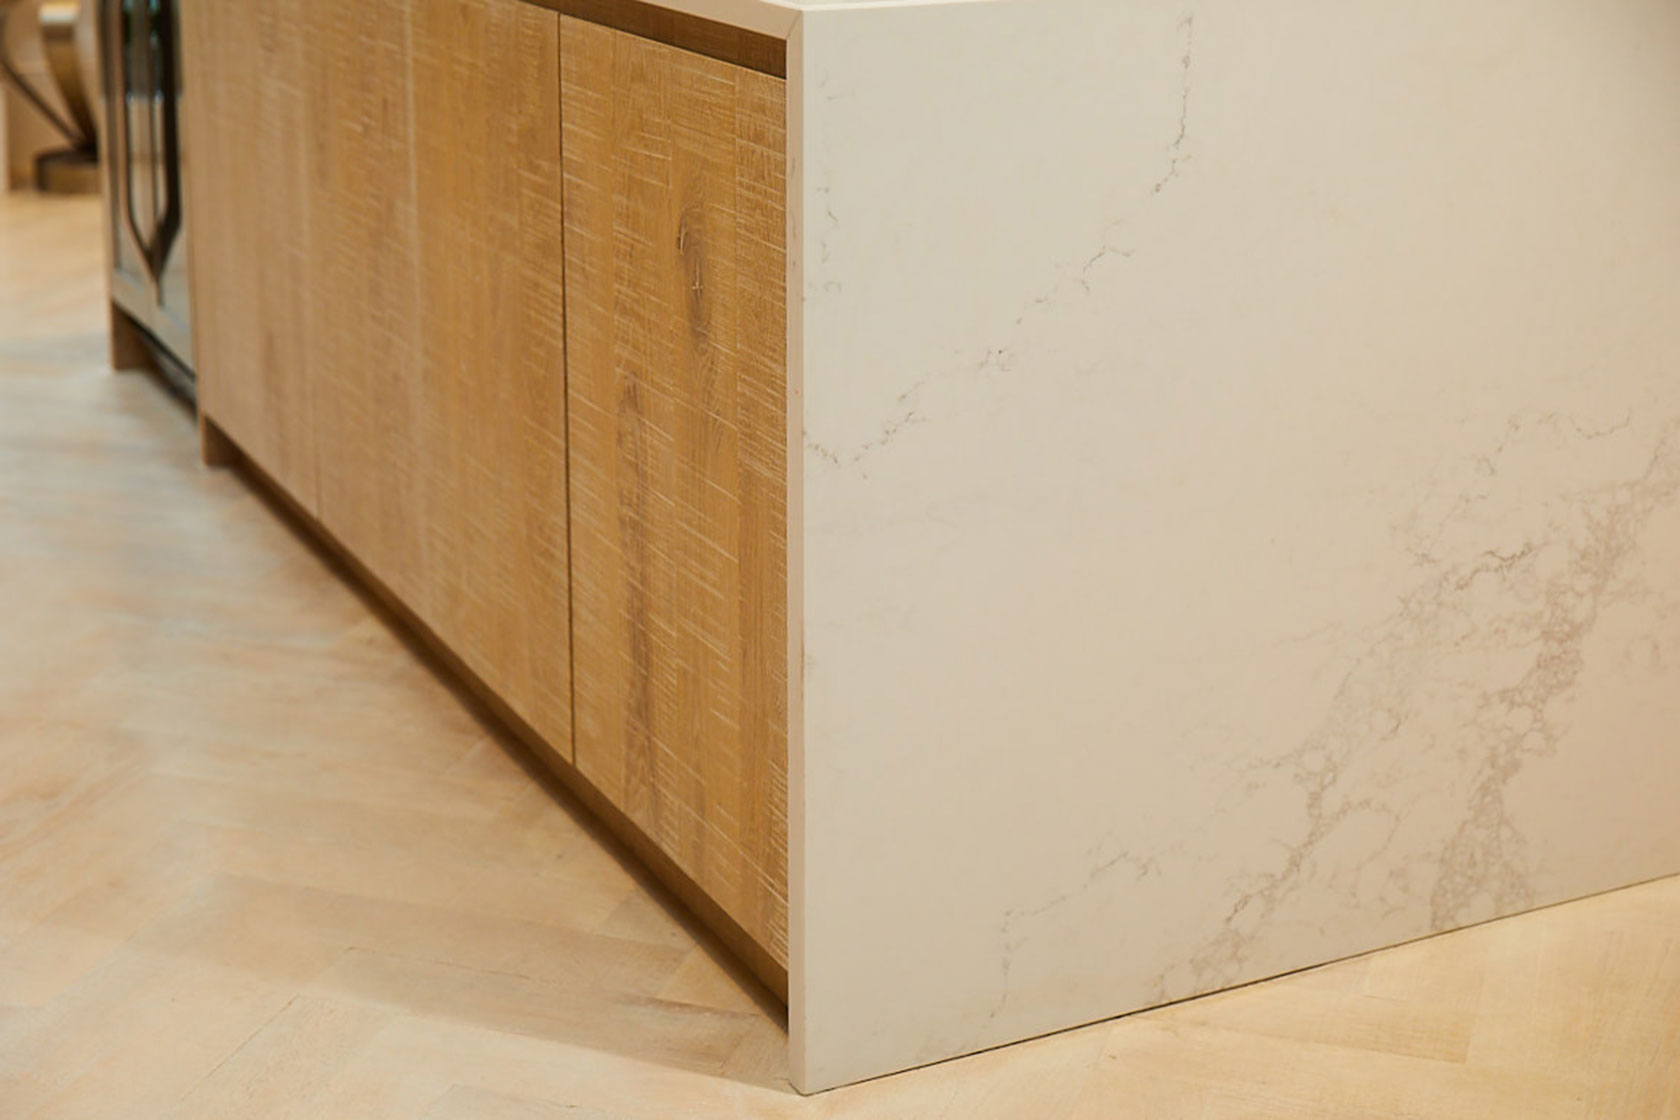 Slab oak kitchen cabinets sit on oak wood parquet flooring